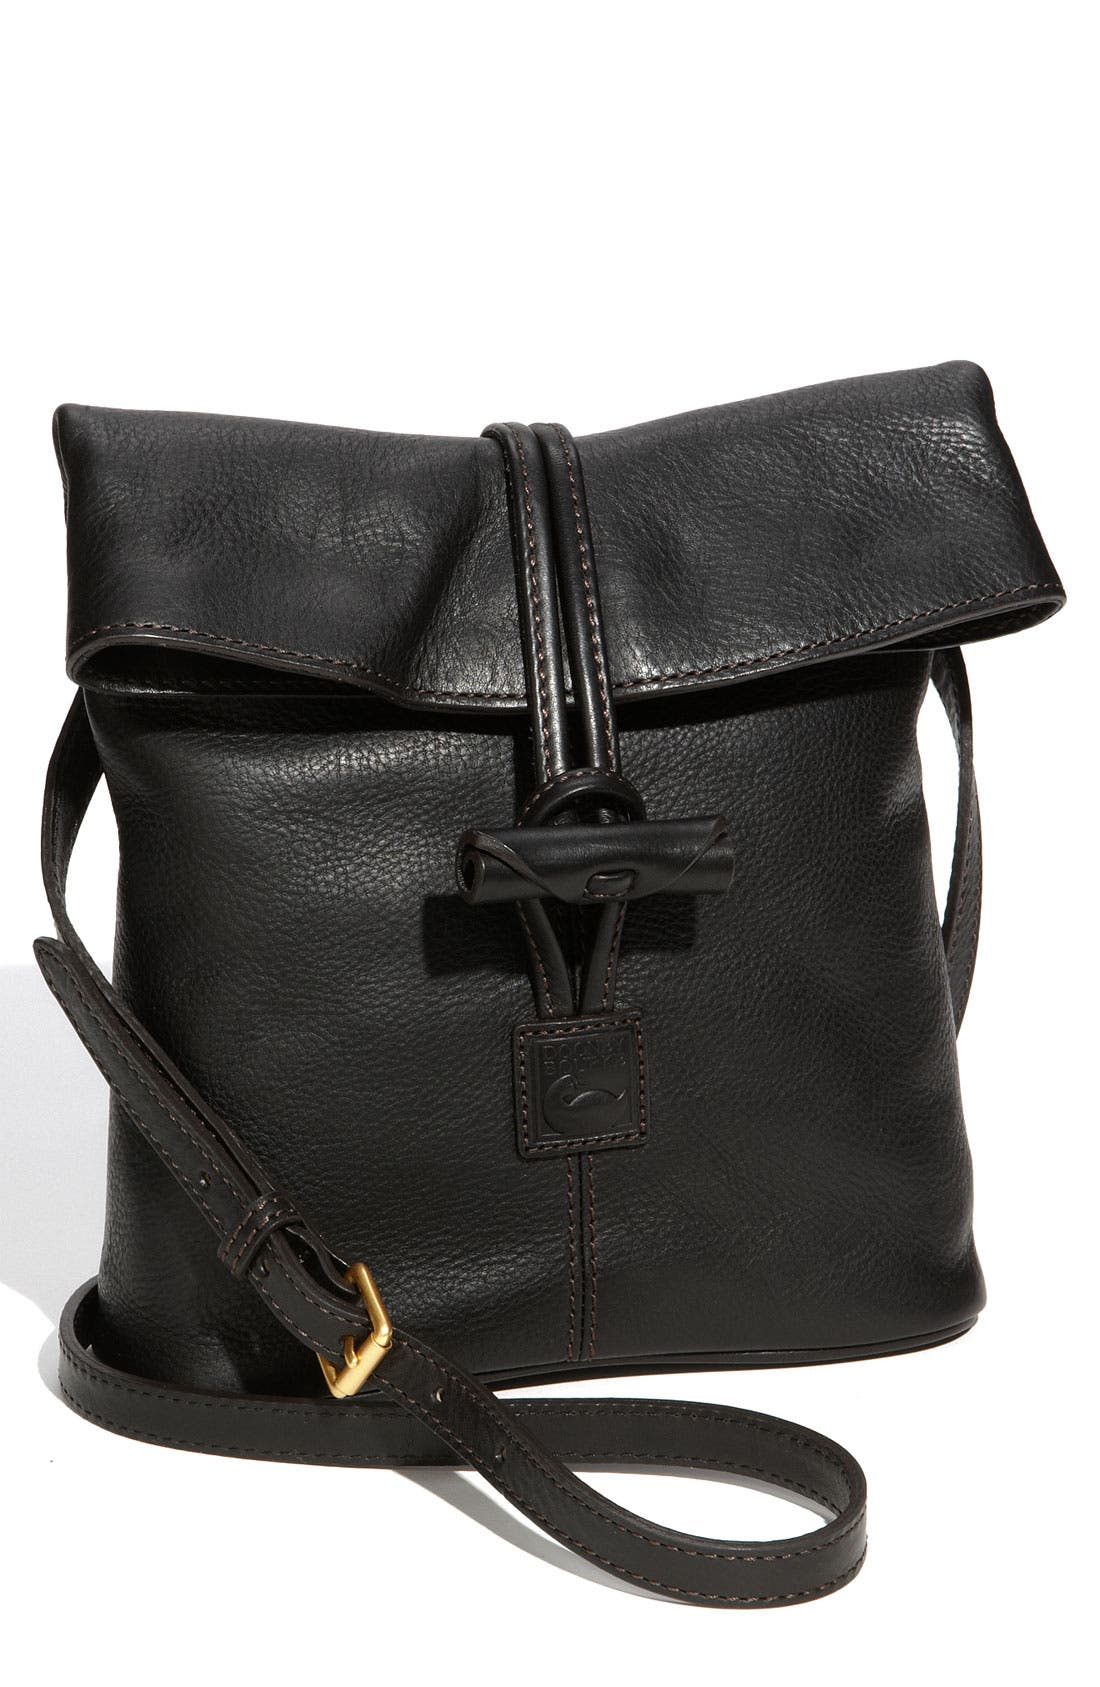 Alternate Image 1 Selected - Dooney & Bourke 'Florentine Toggle' Crossbody Bag